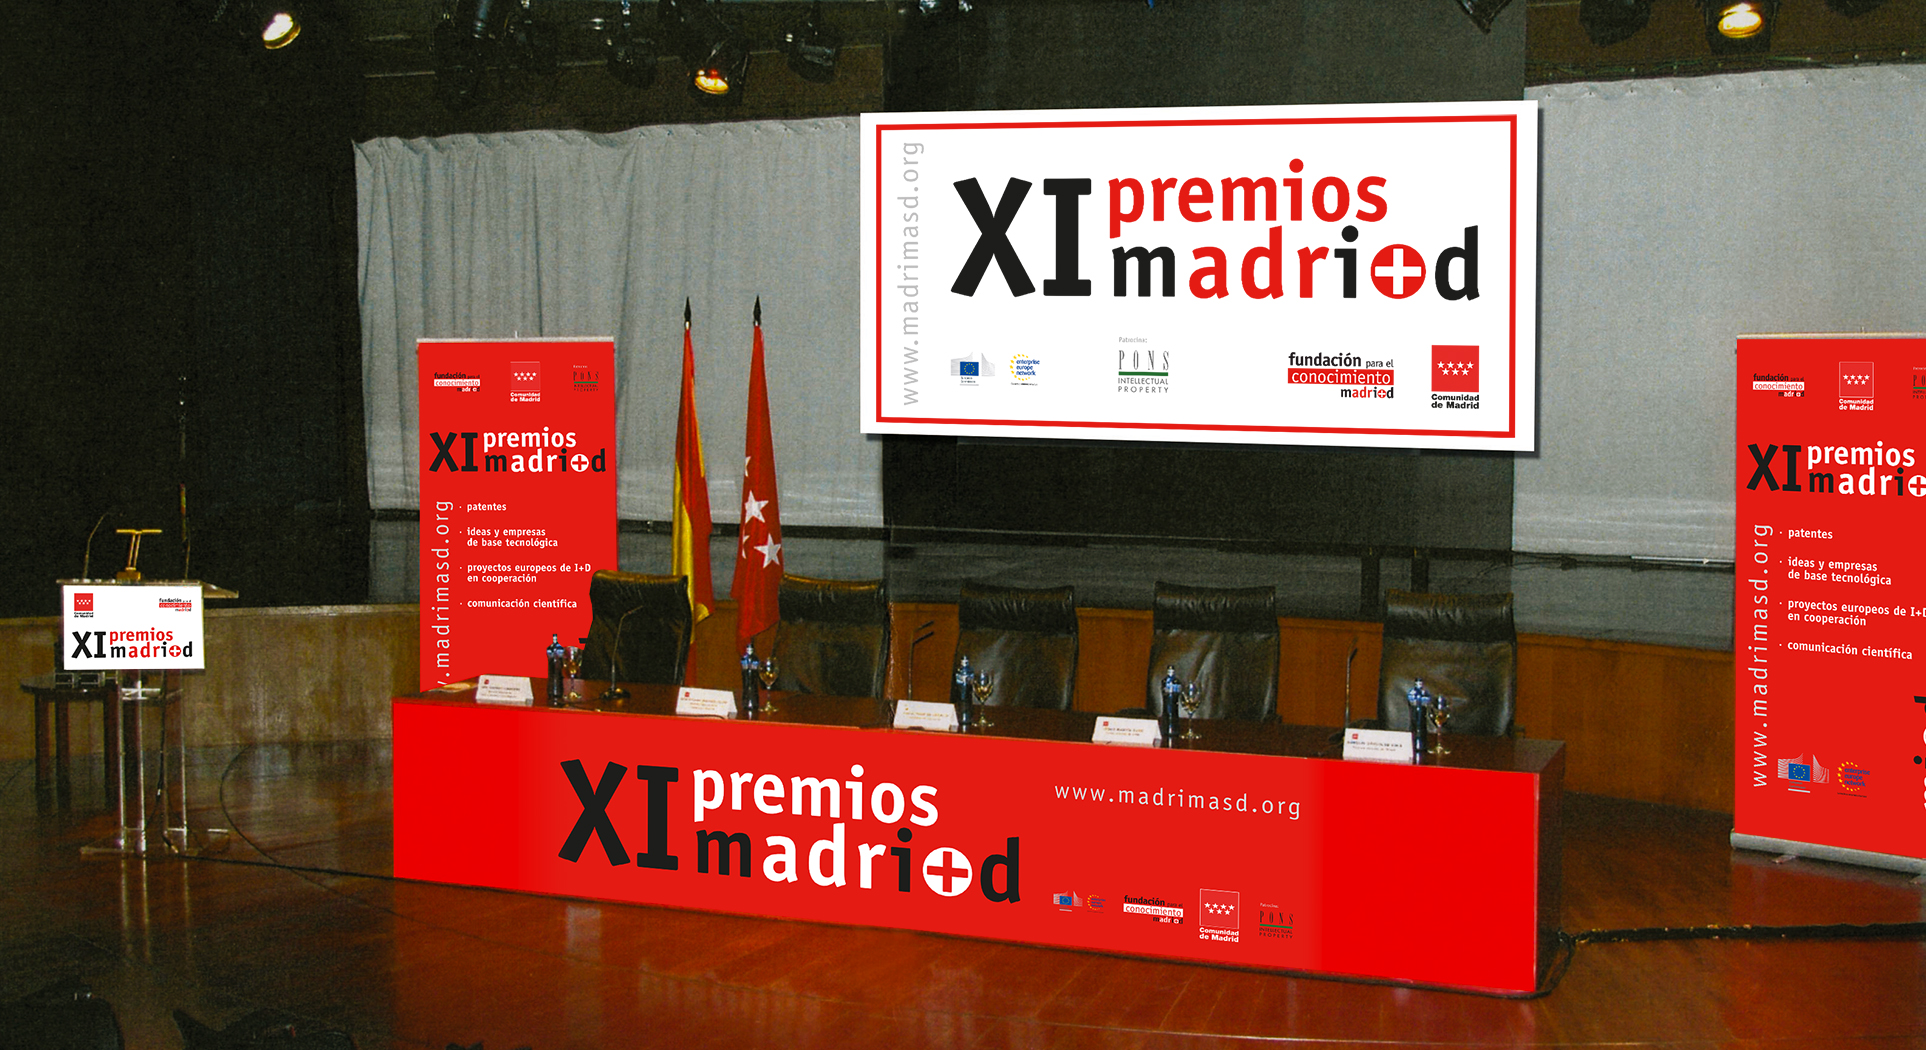 Premios Madri+d